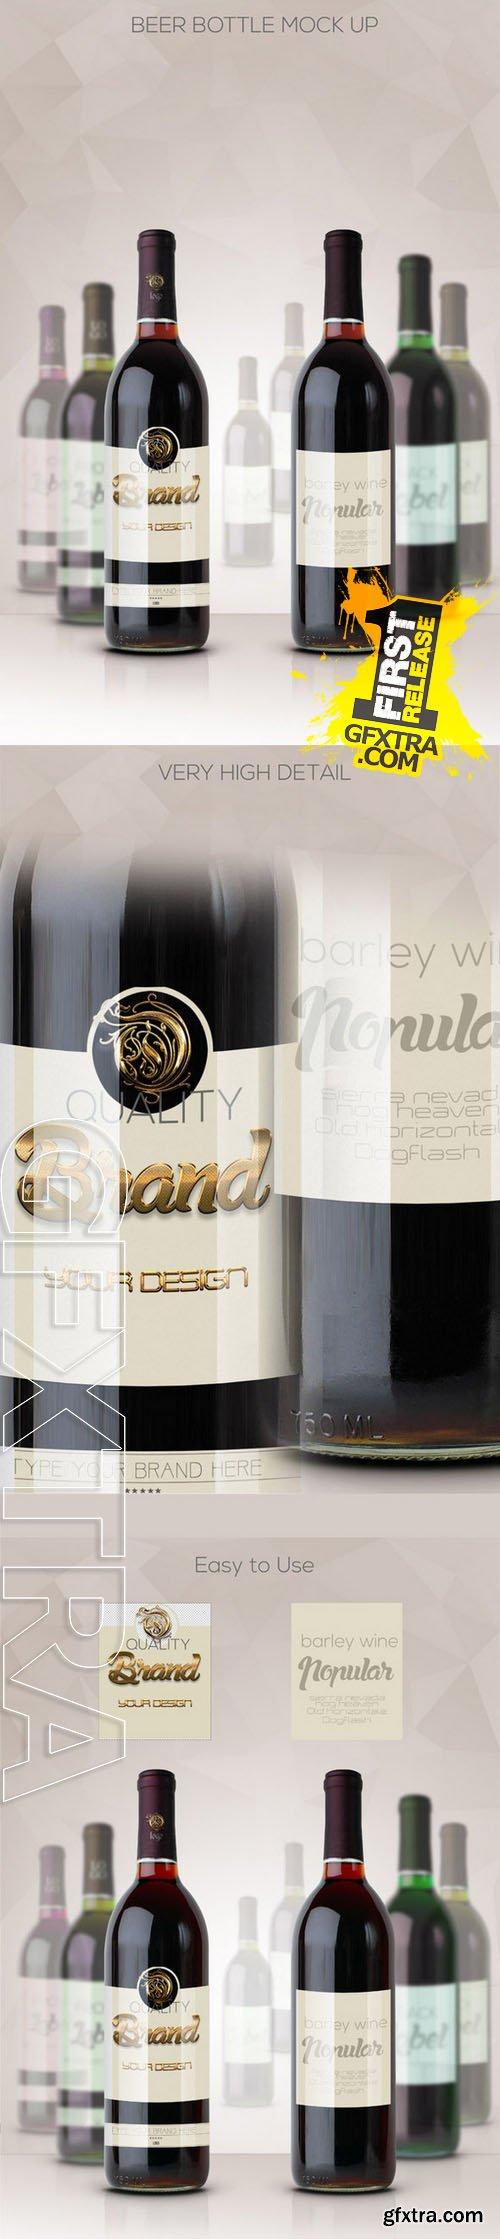 Bottle Wine Mockup - CM 168819